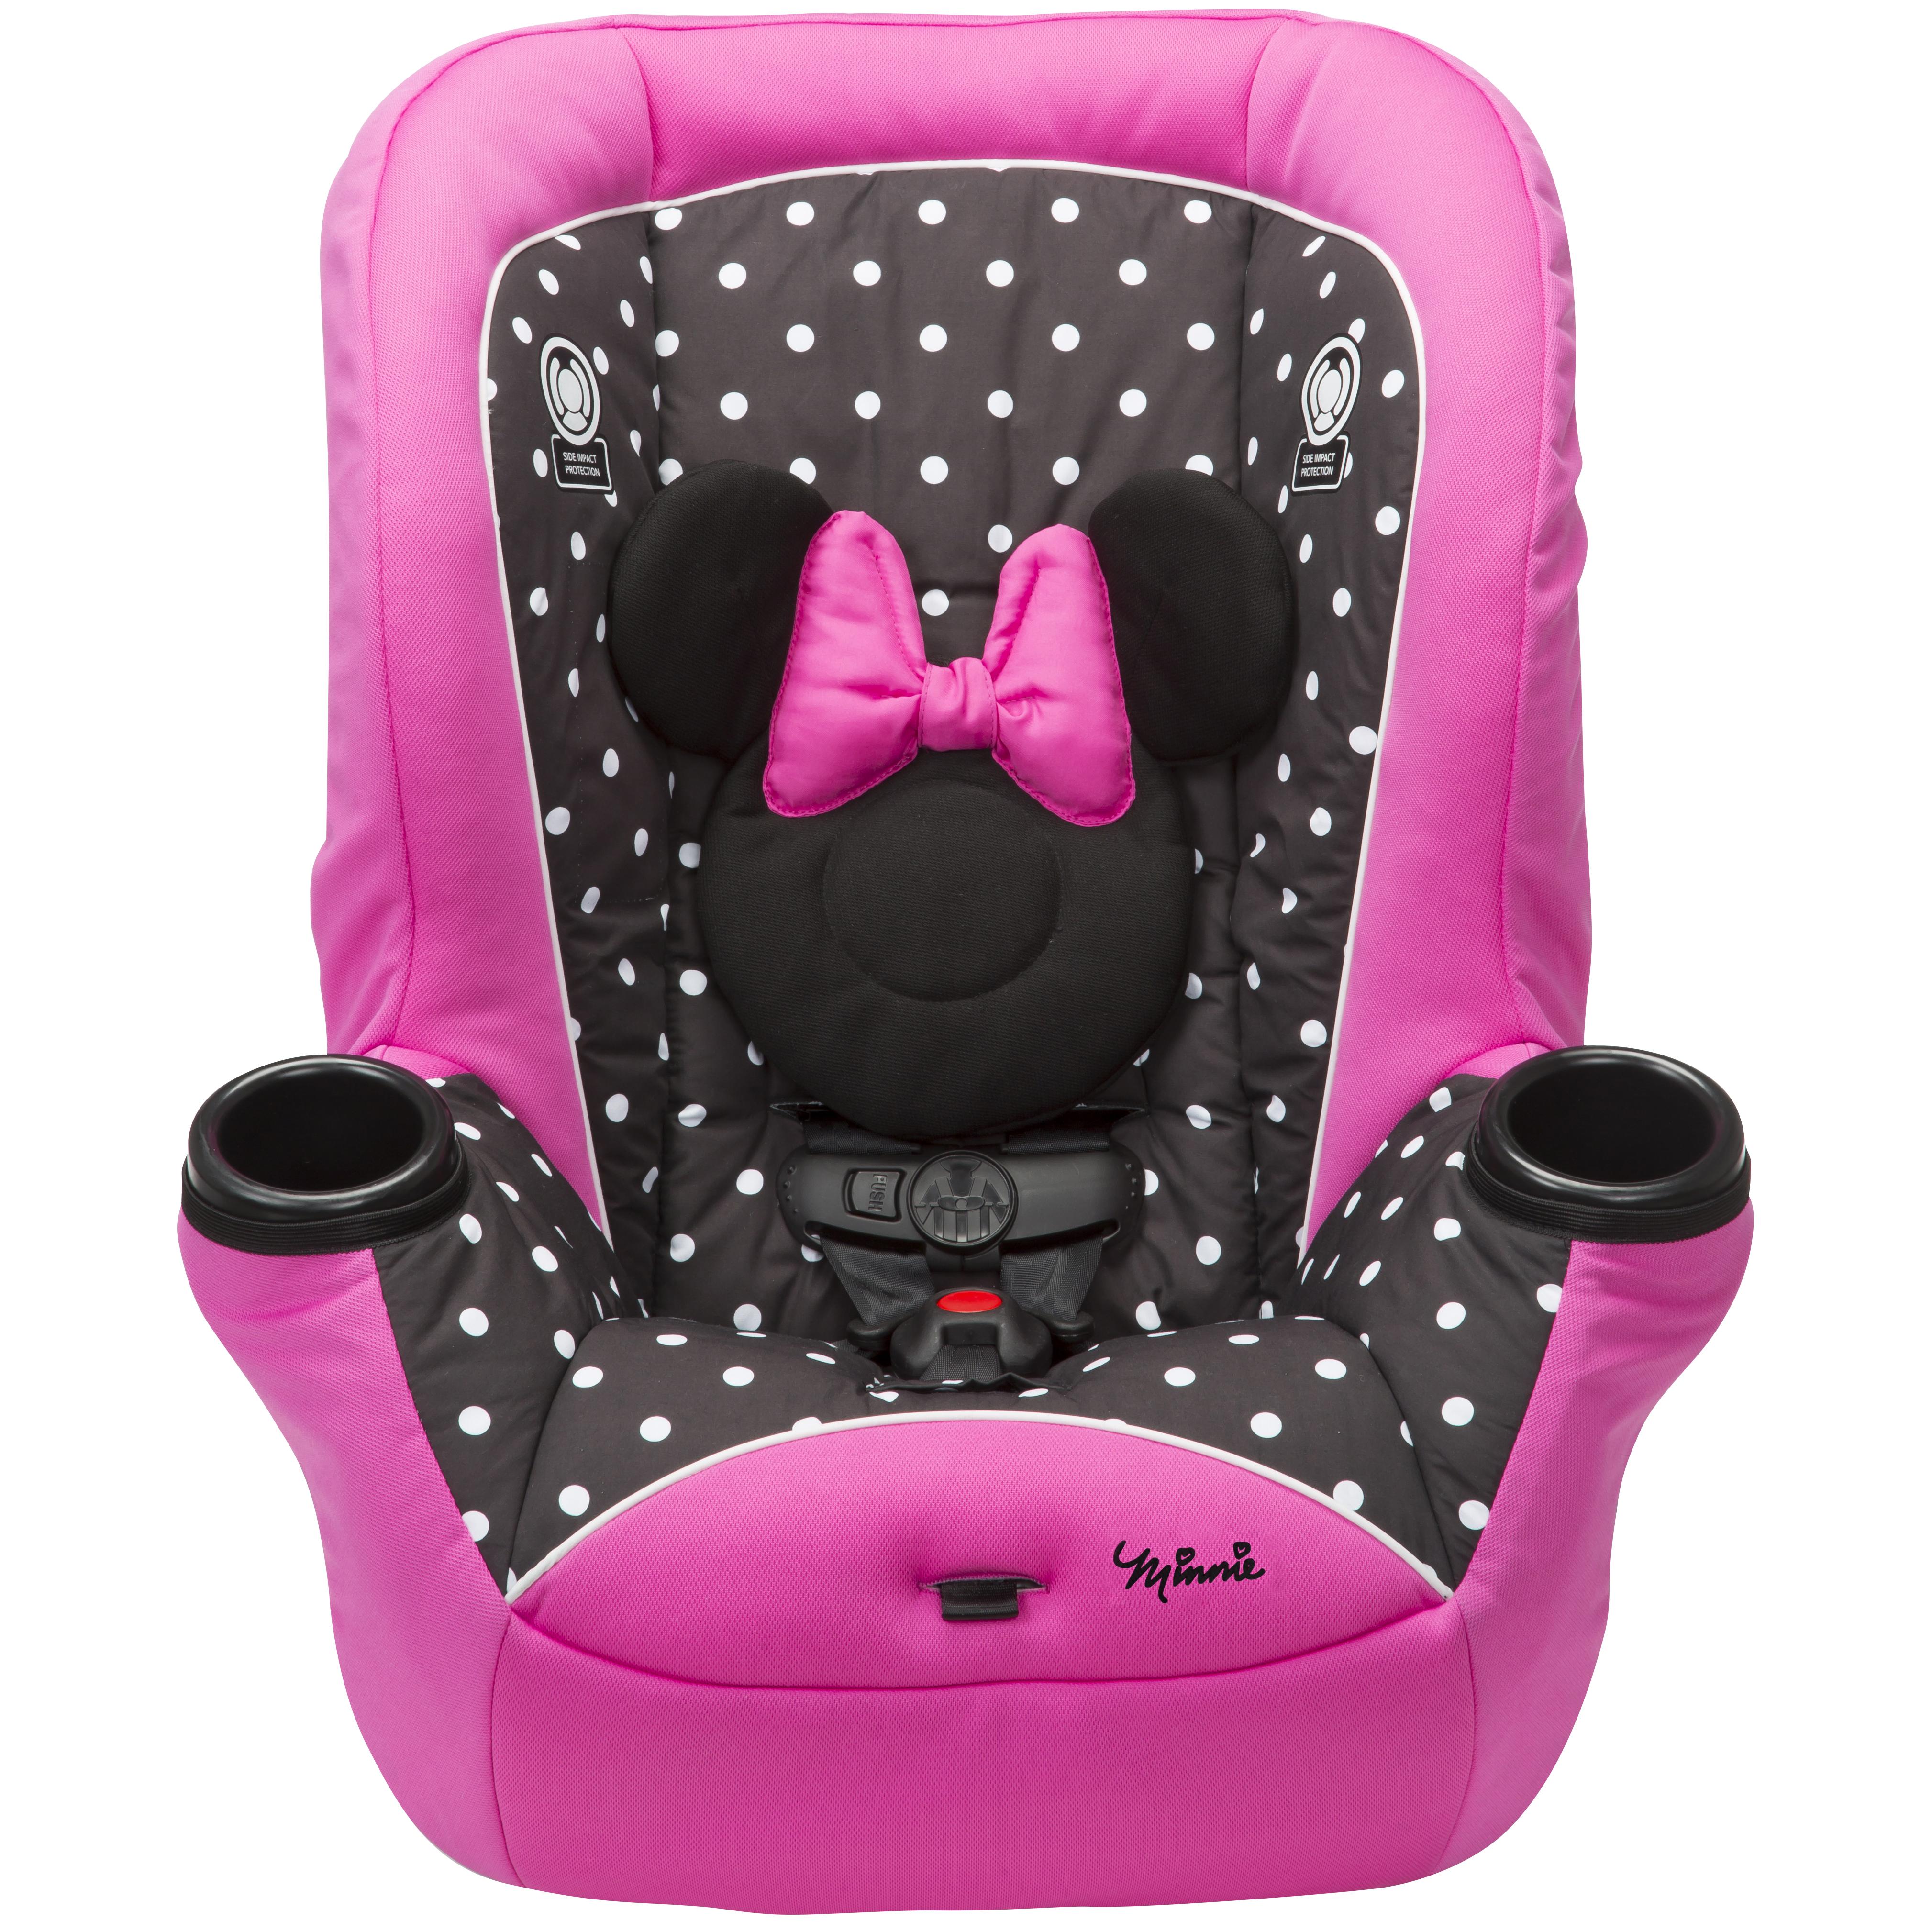 Disney-Baby-Apt-40RF-Convertible-Car-Seat-Minnie-or-Mickey thumbnail 20